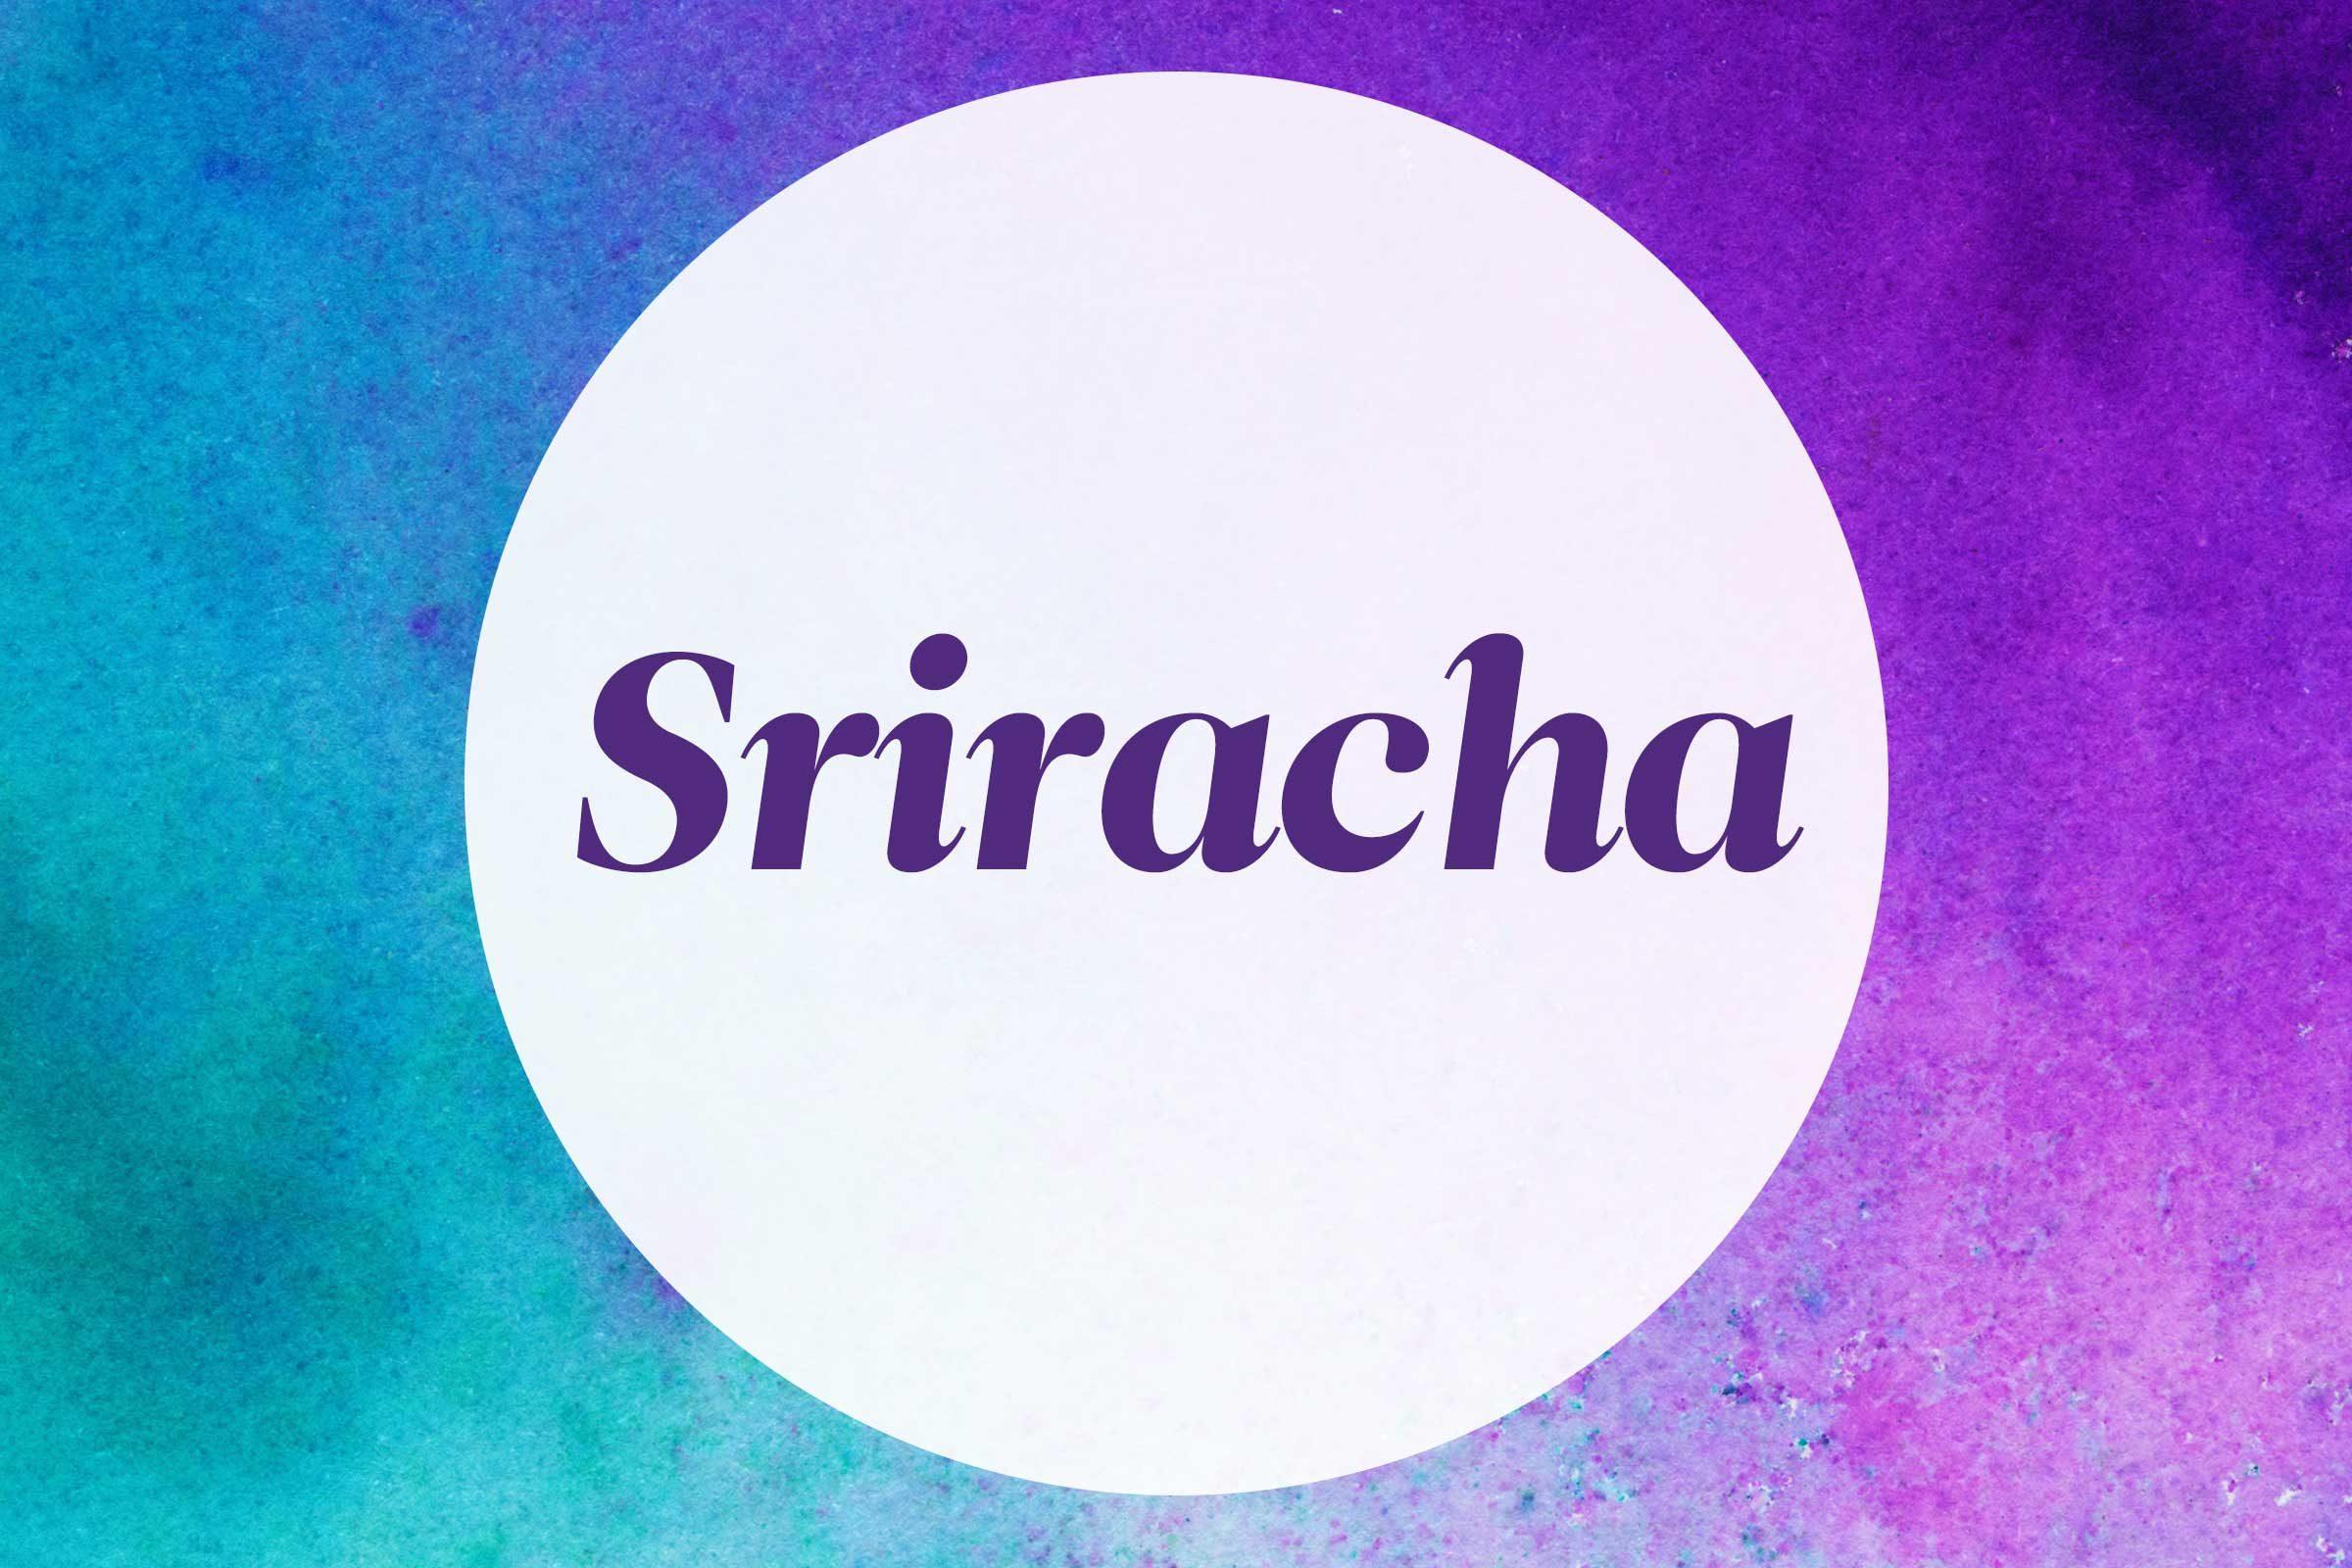 Madison : Gnocchi definition pronunciation